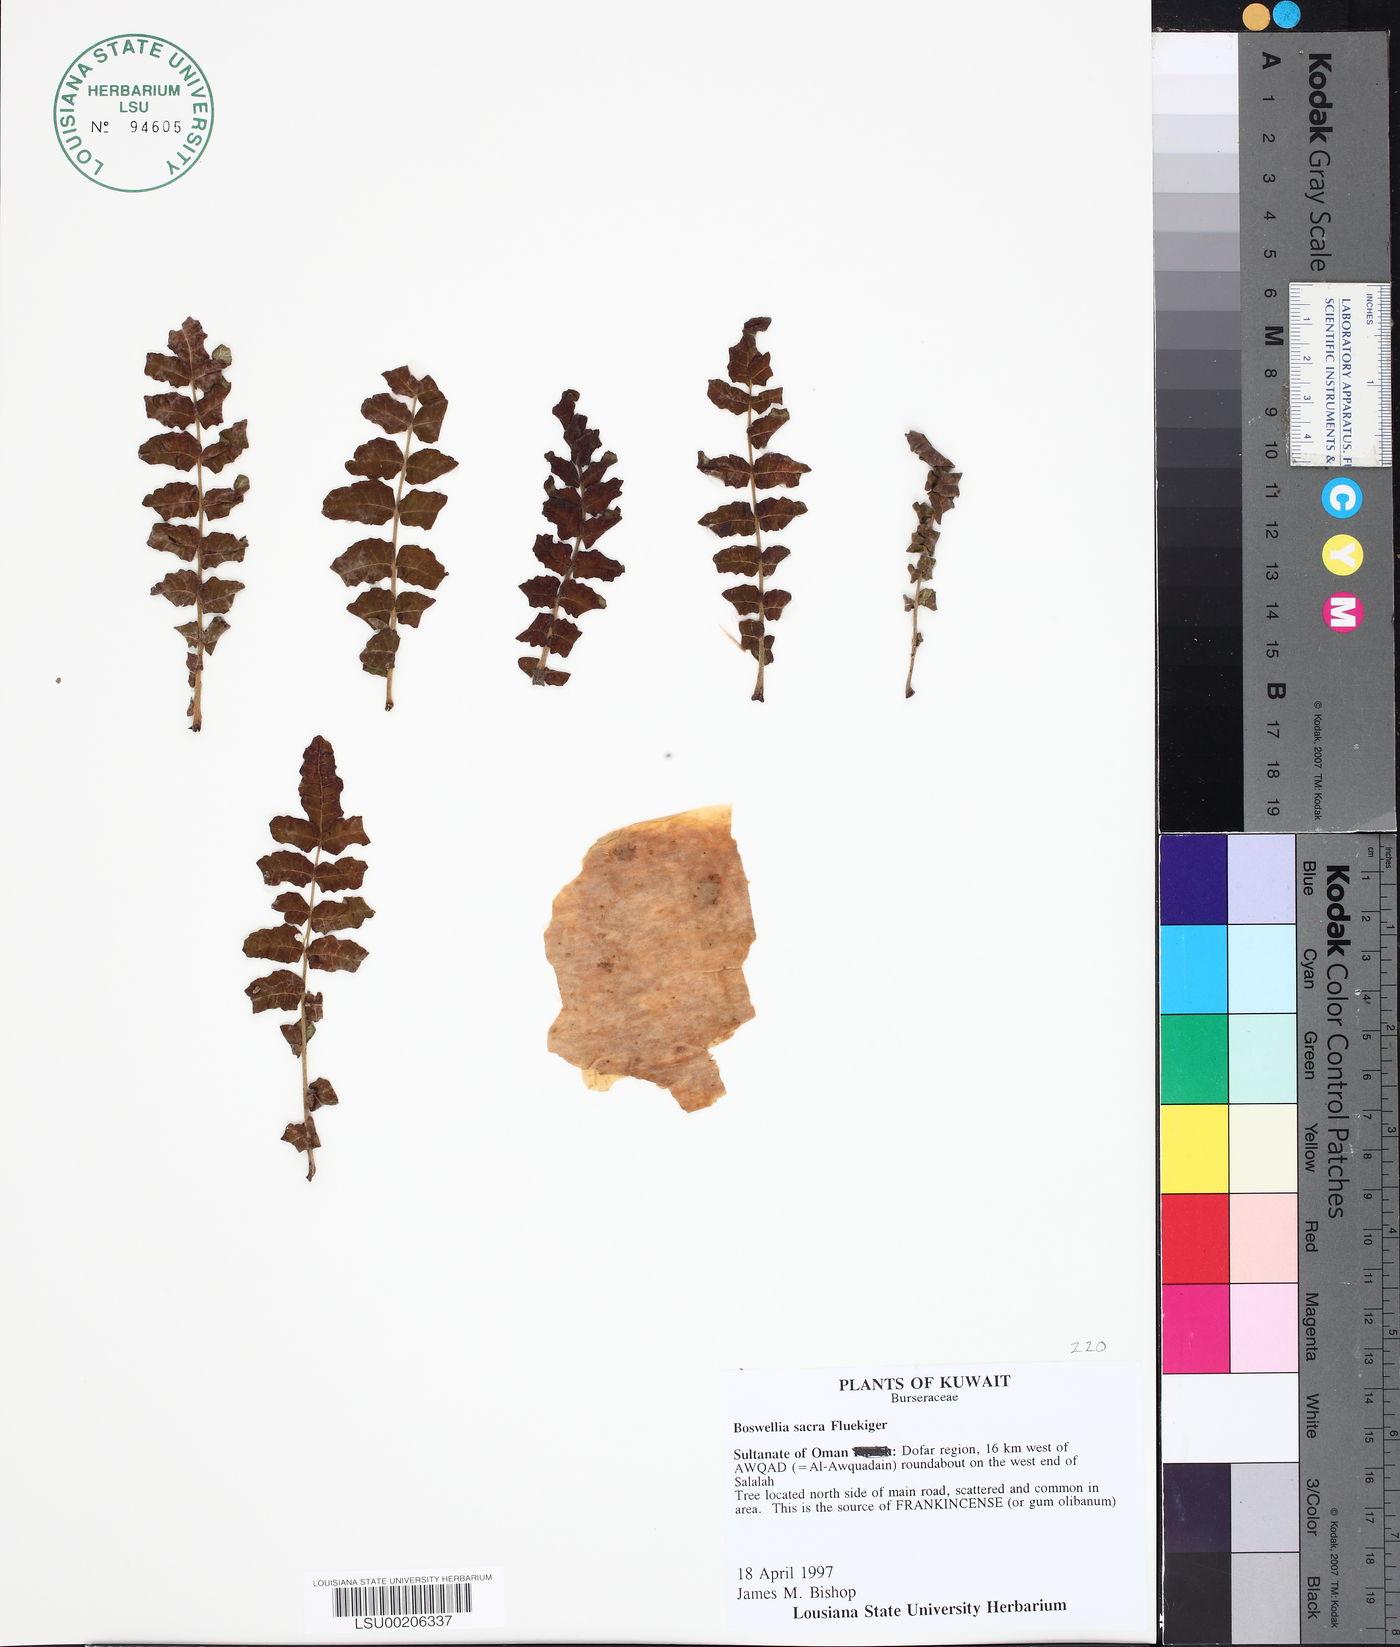 Boswellia sacra image